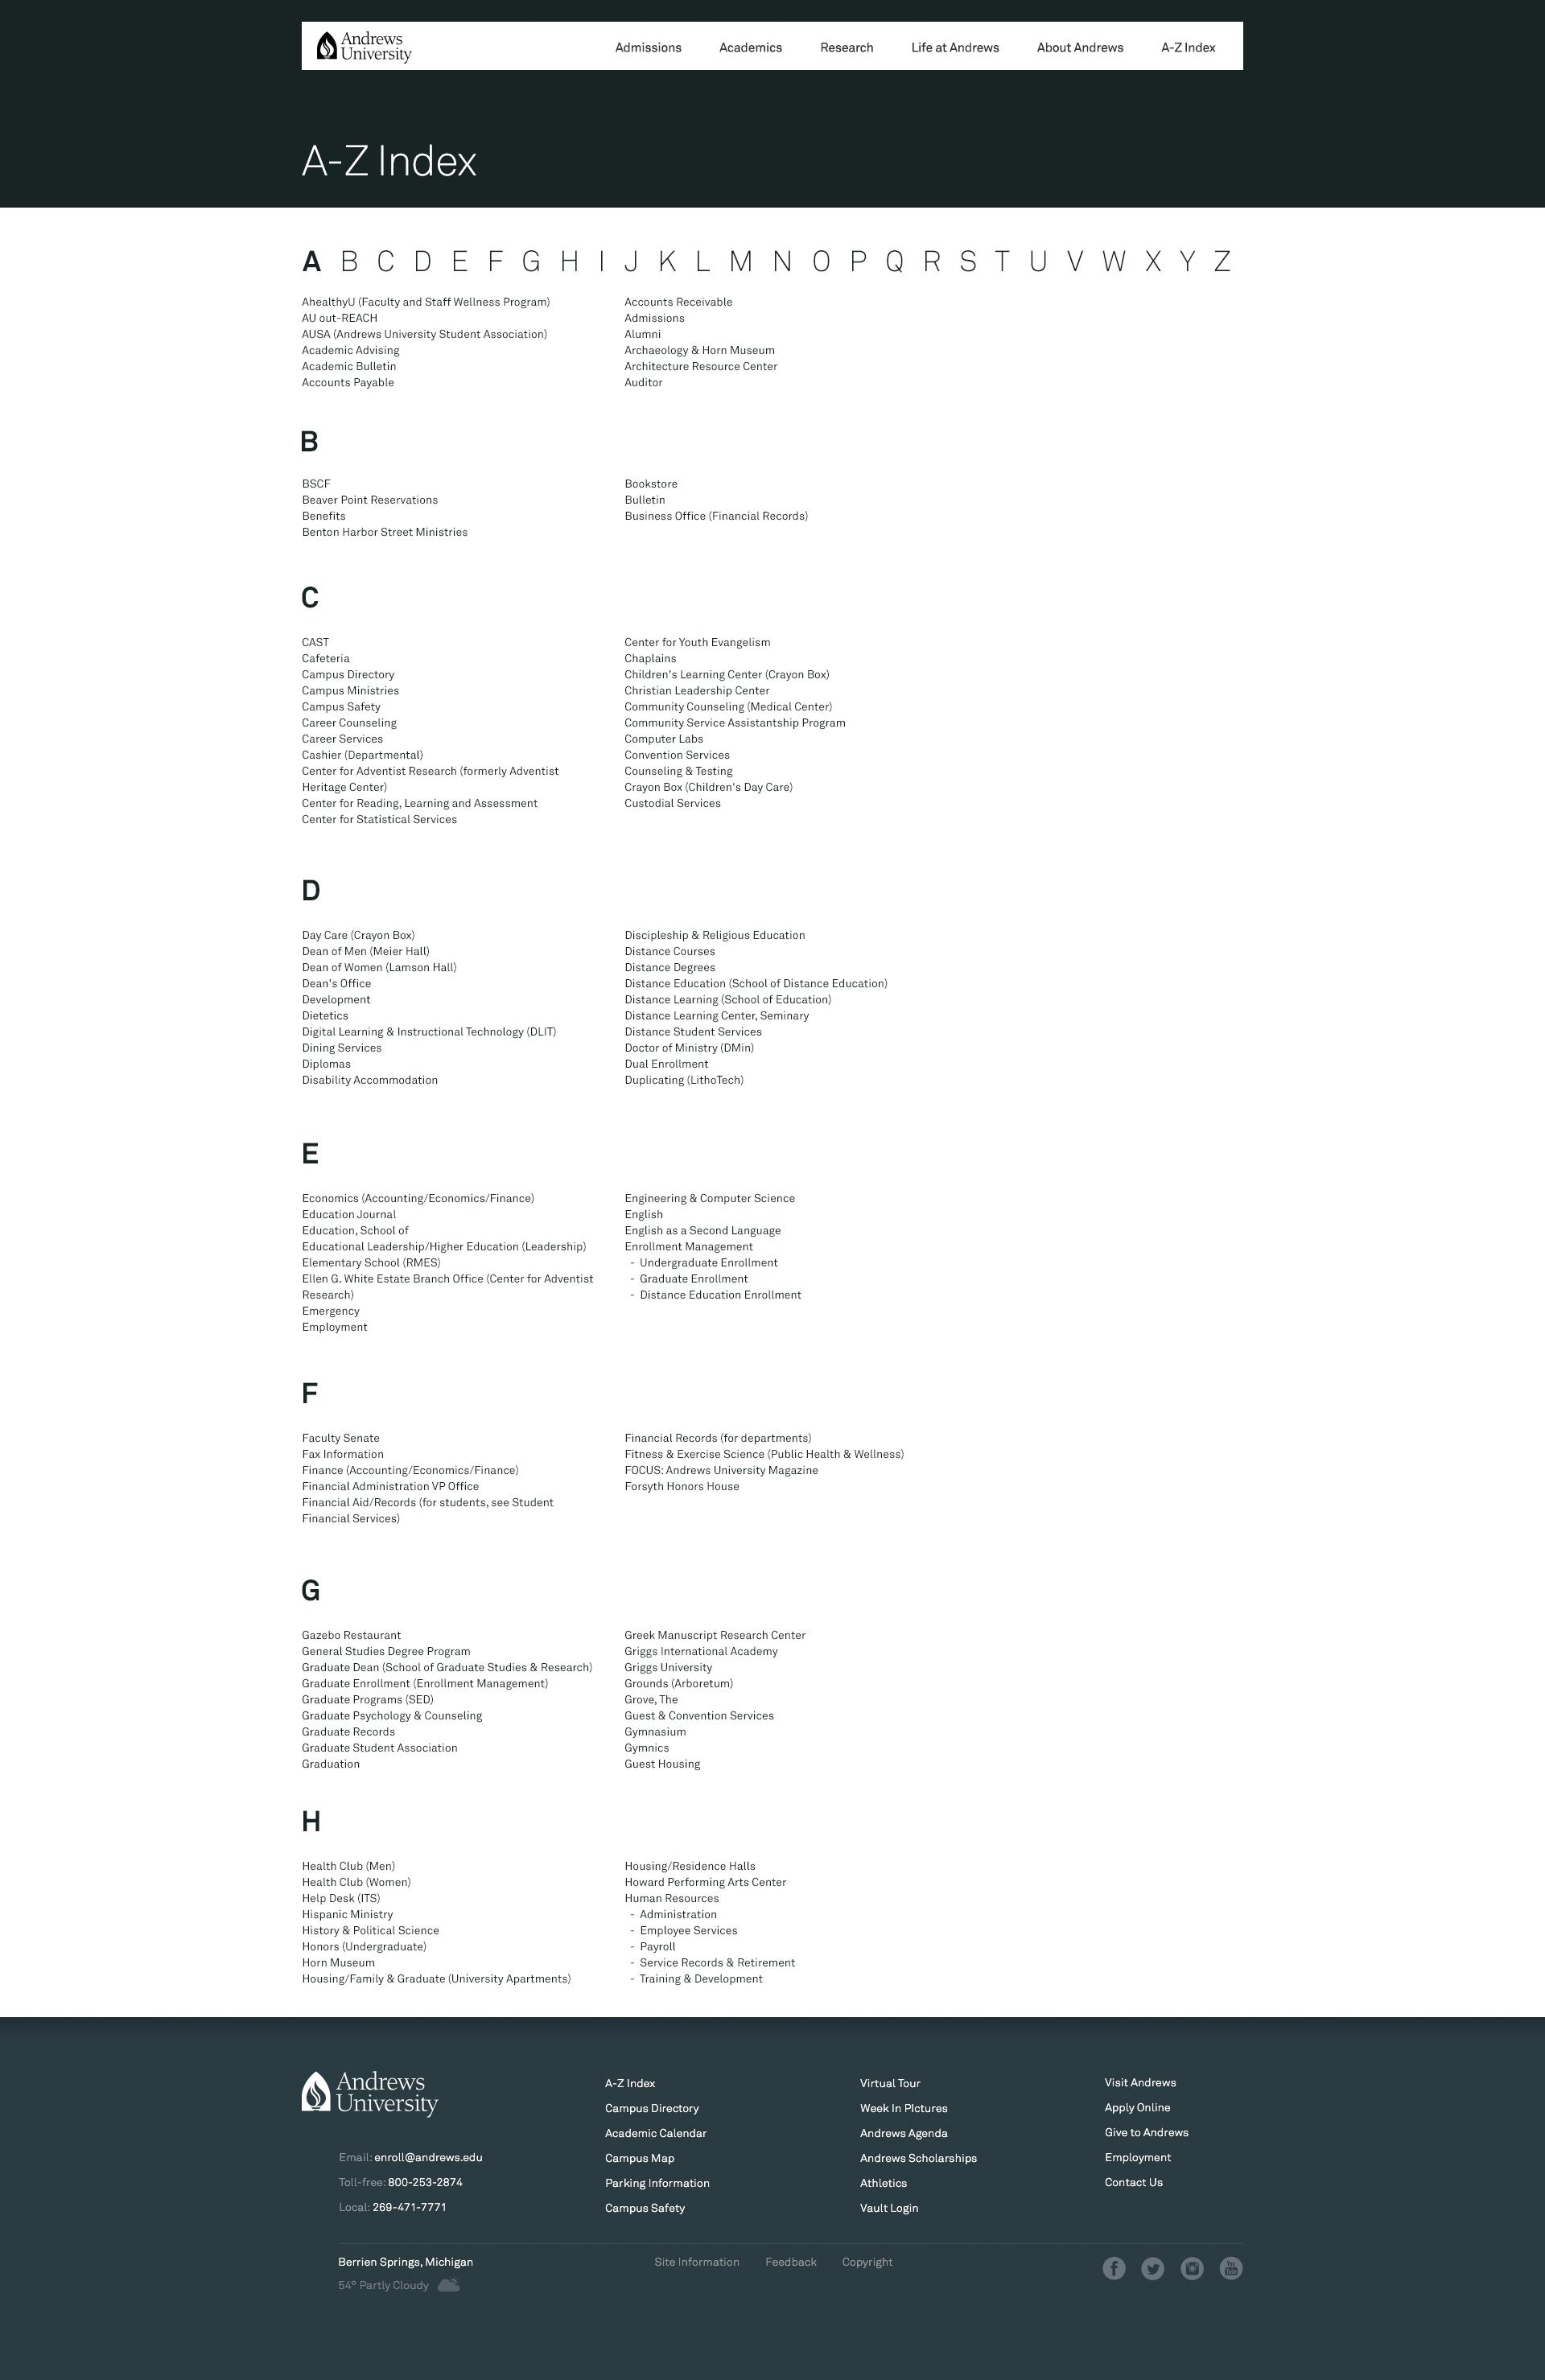 A-Z Index